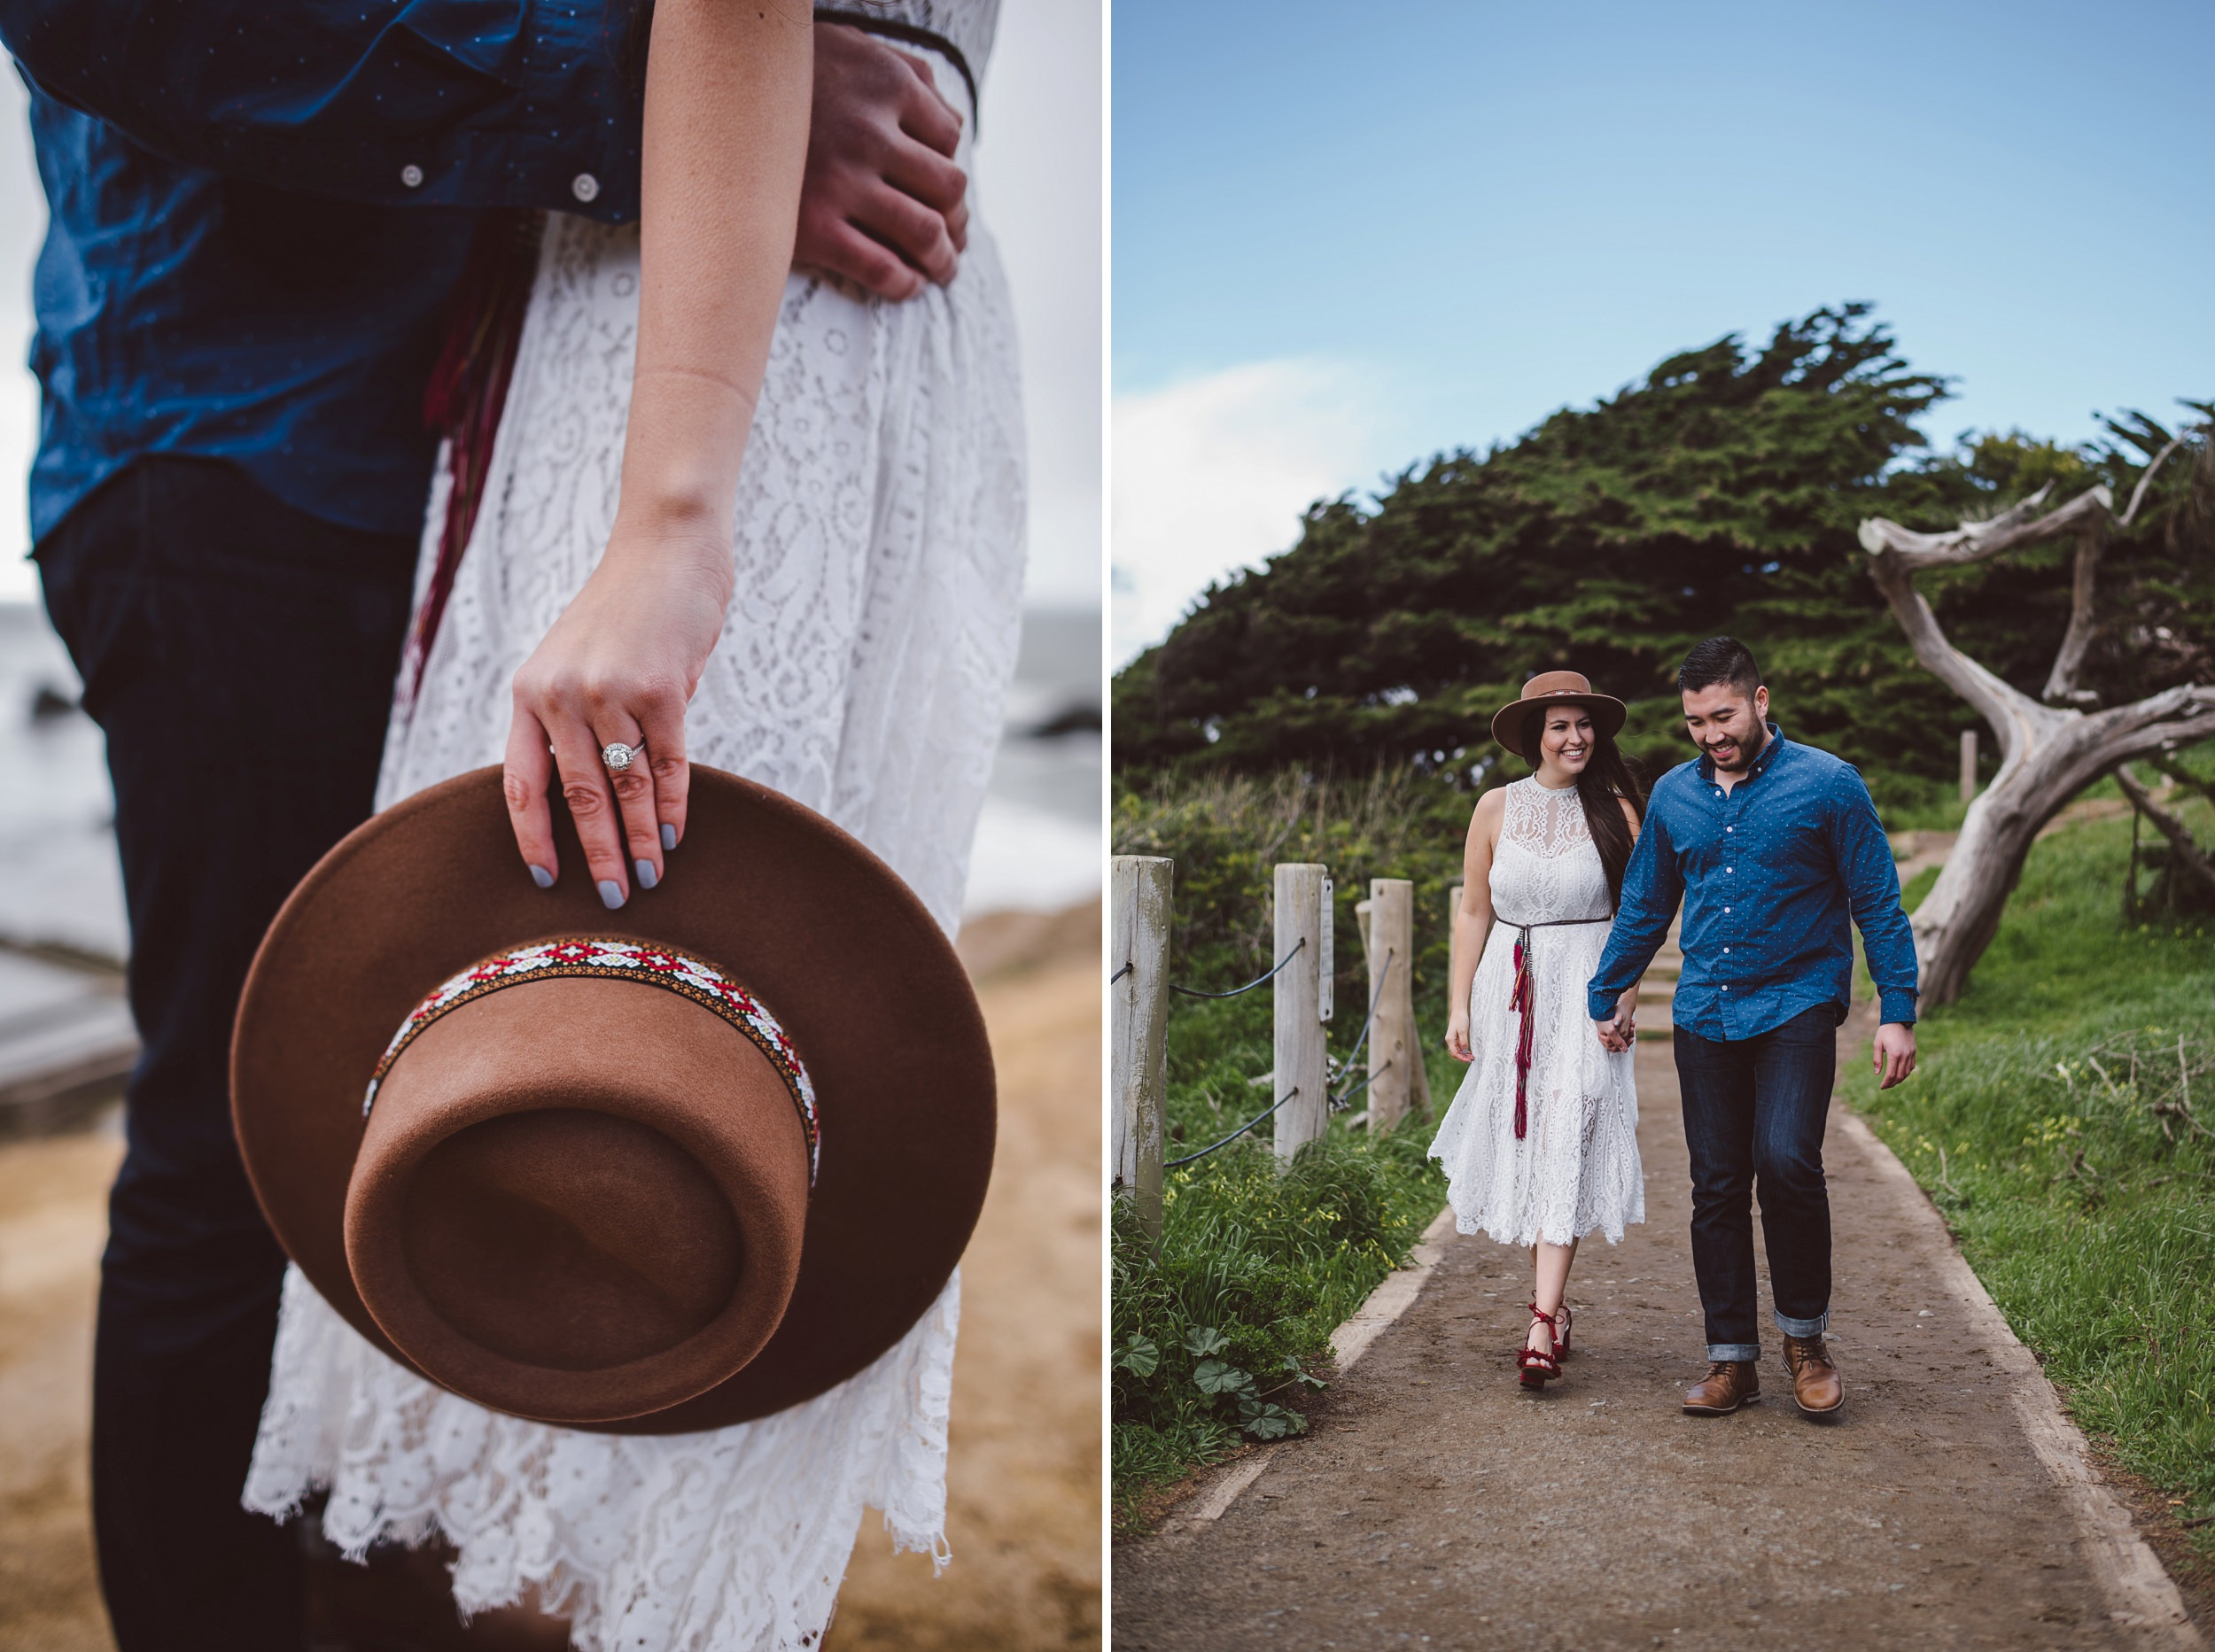 Lands-End-Sutro-Baths-San-Francisco-Engagement-Photography-004a.jpg